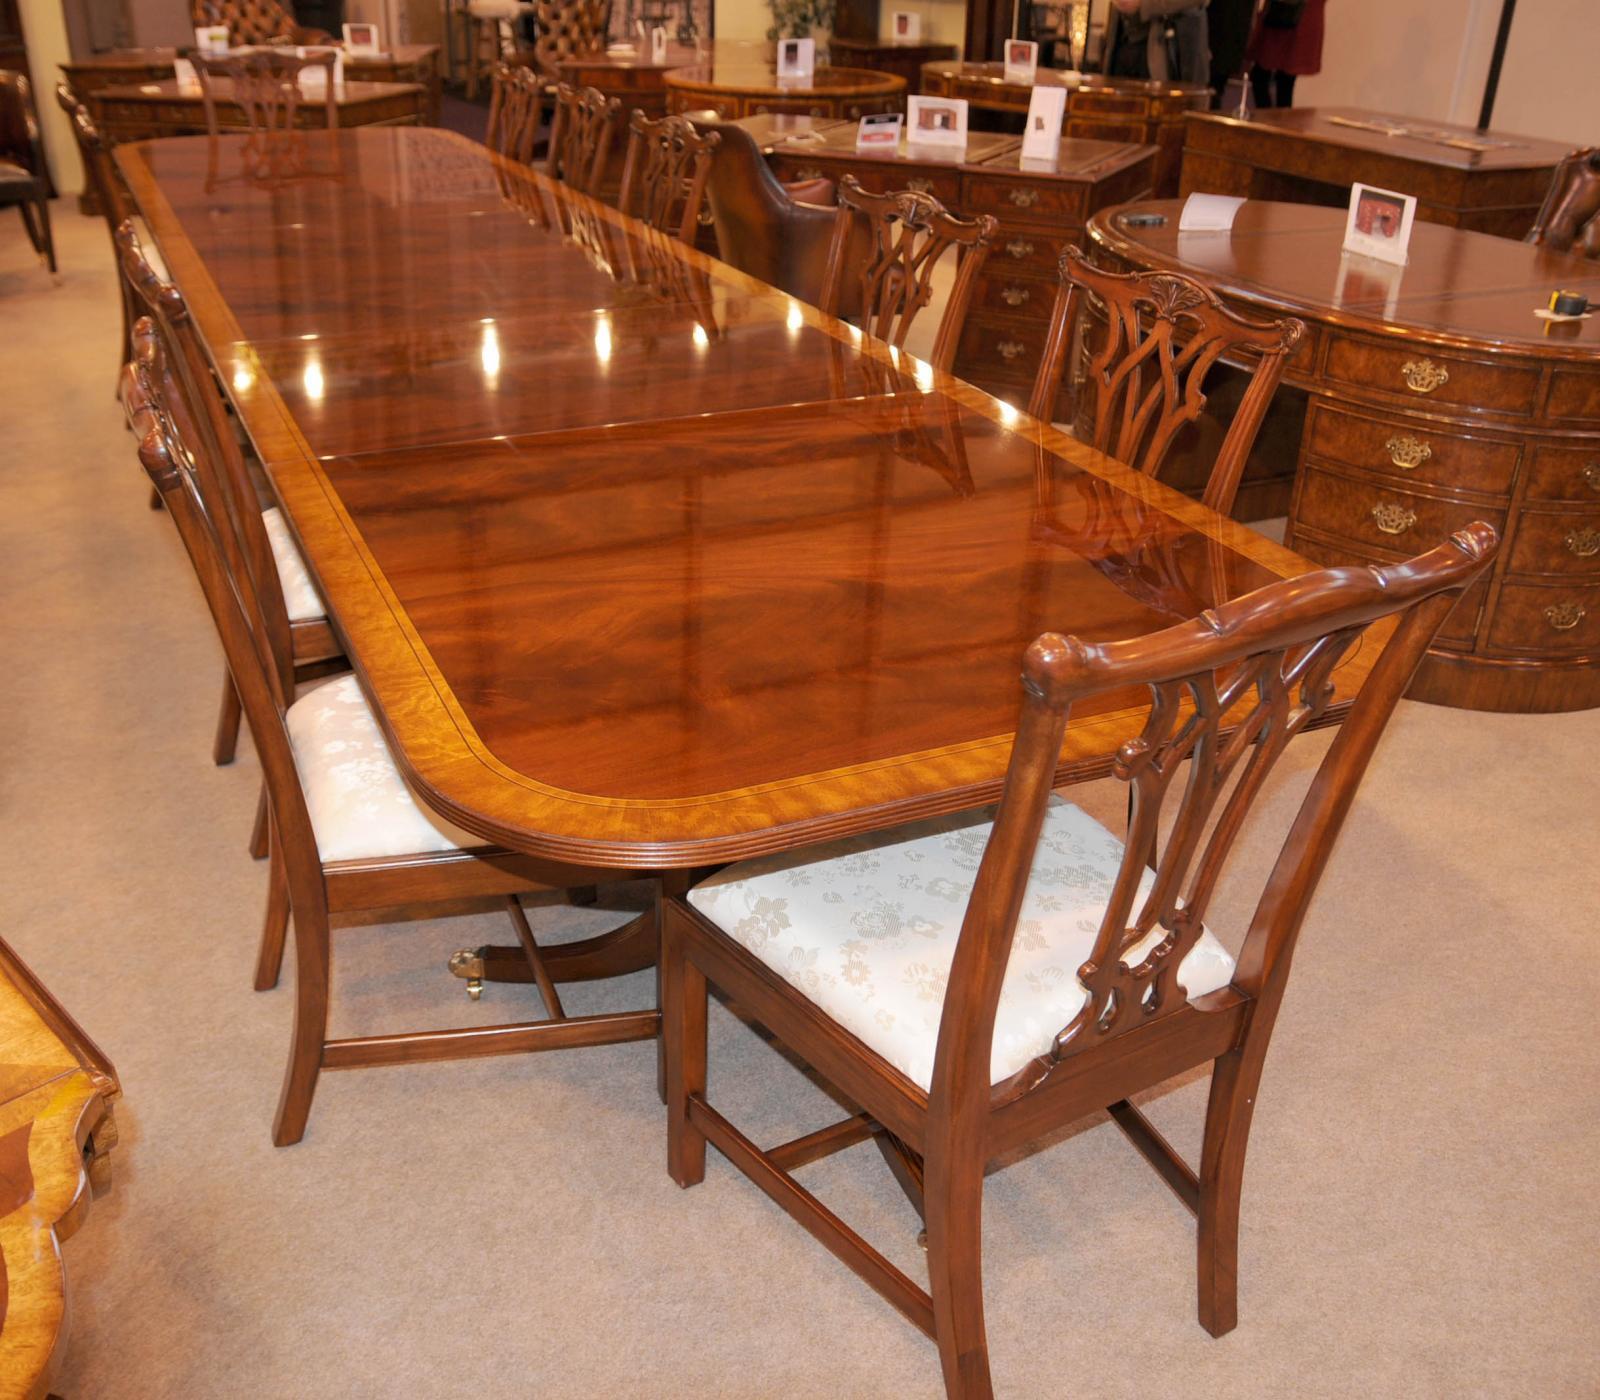 16 Ft Regency Dining Table Triple Pedestal Mahogany Diner | EBay